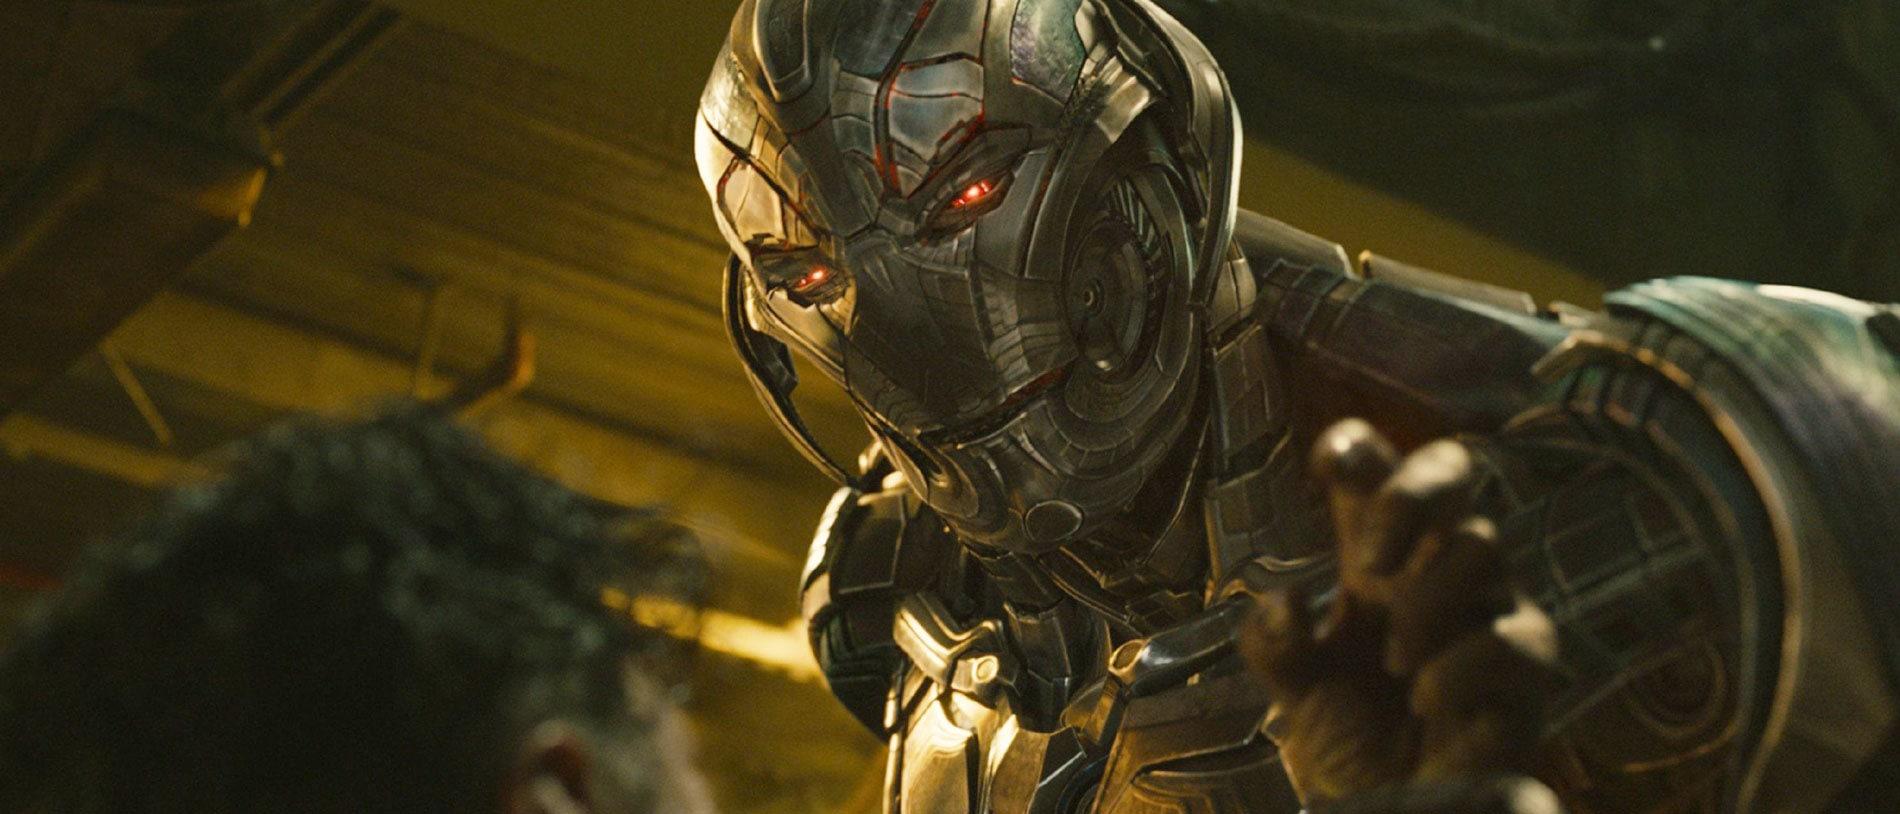 Ultron-James-Spader-WandaVision